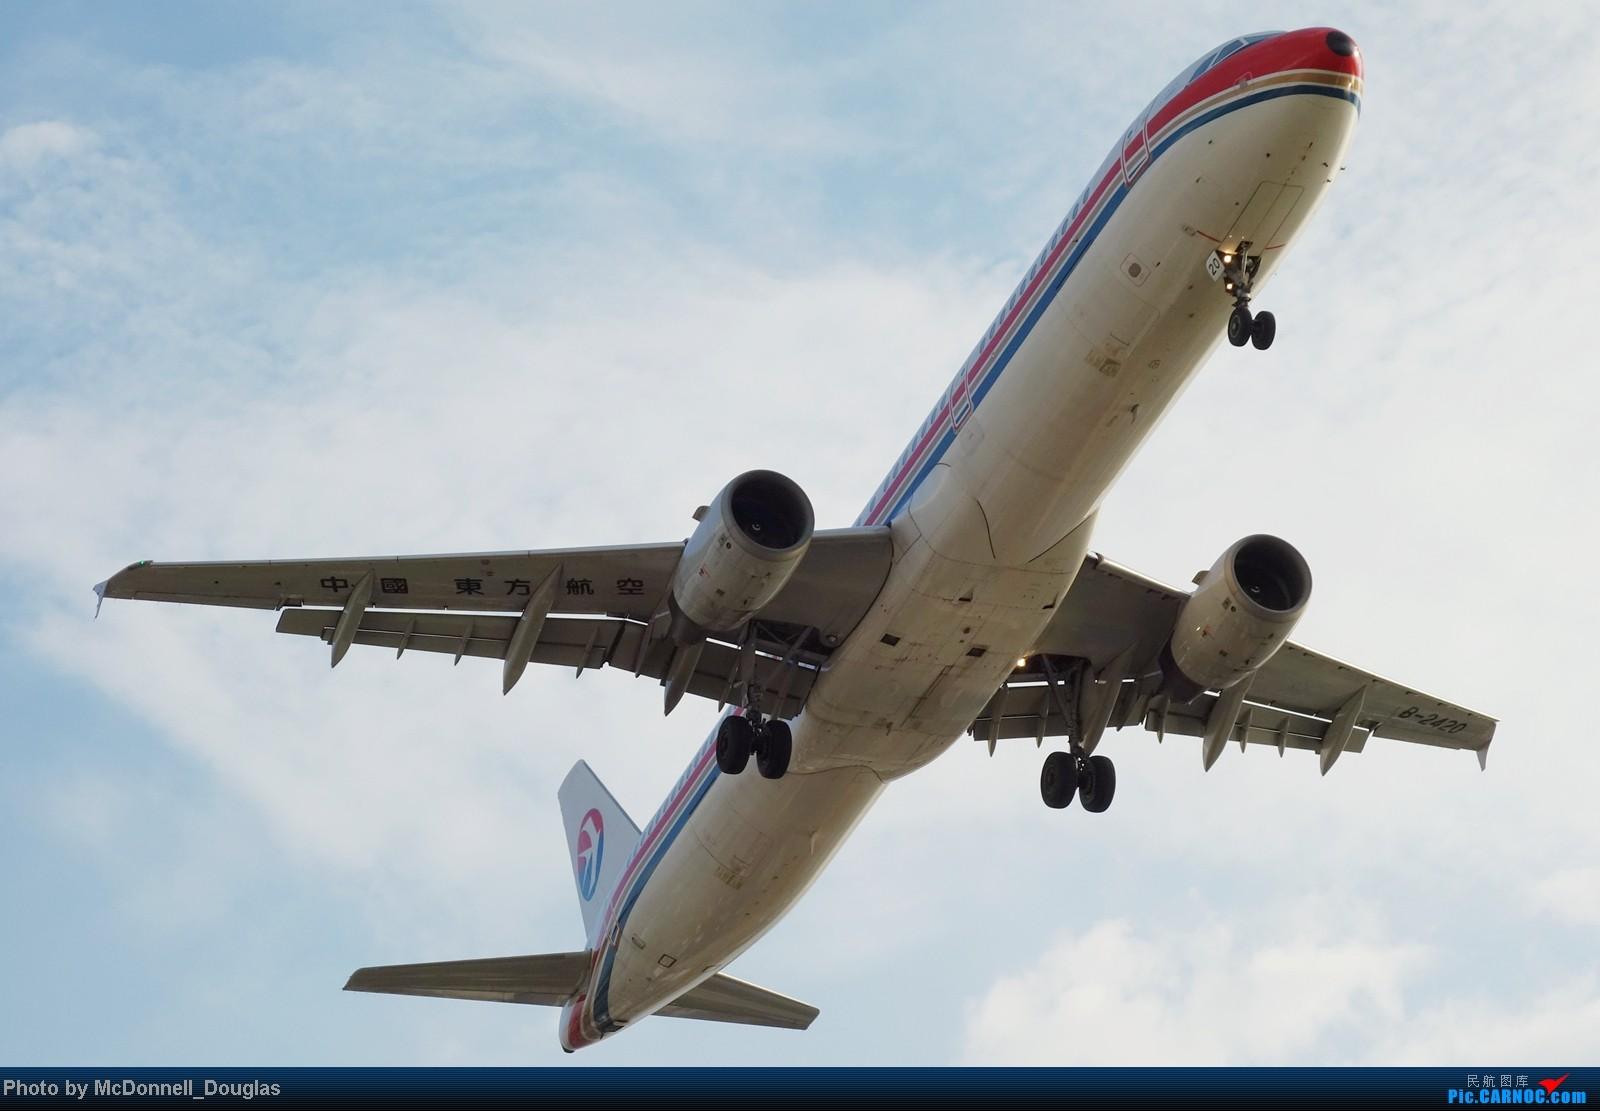 Re:[原创]【上海飞友会】ZSSS杂图一组 AIRBUS A321-200 B-2420 中国上海虹桥机场